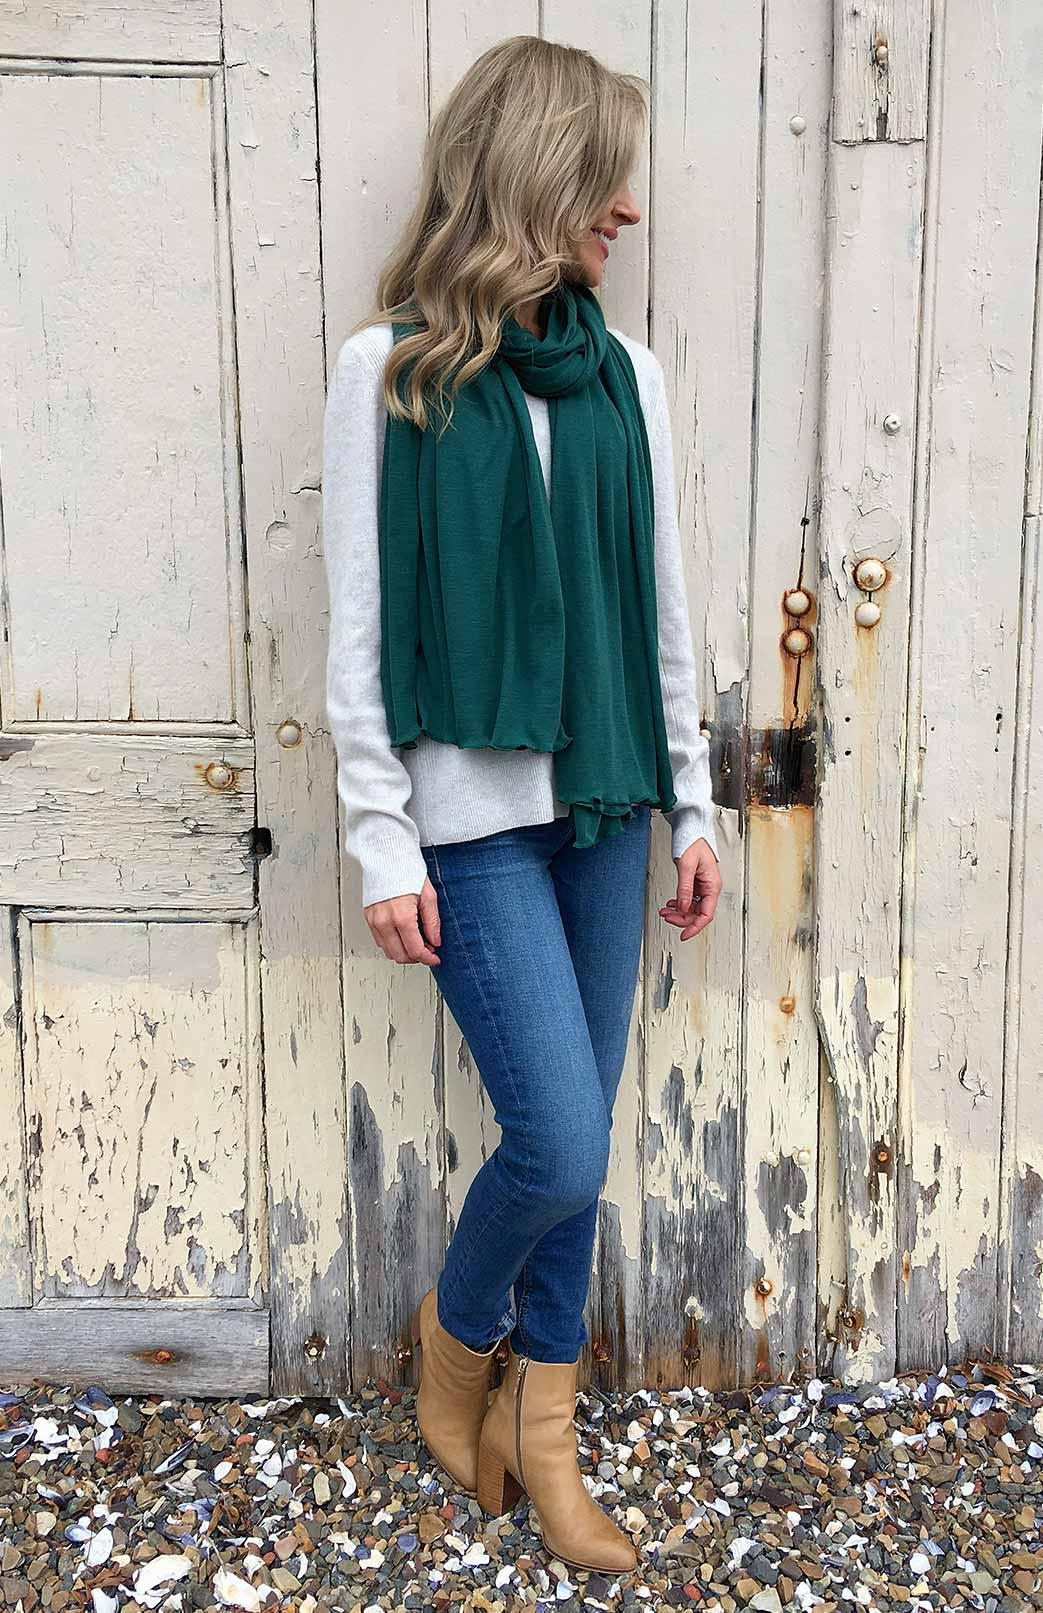 Scarves - Plain - Women's Superfine Green Merino Wool Classic Wide Scarf - Smitten Merino Tasmania Australia